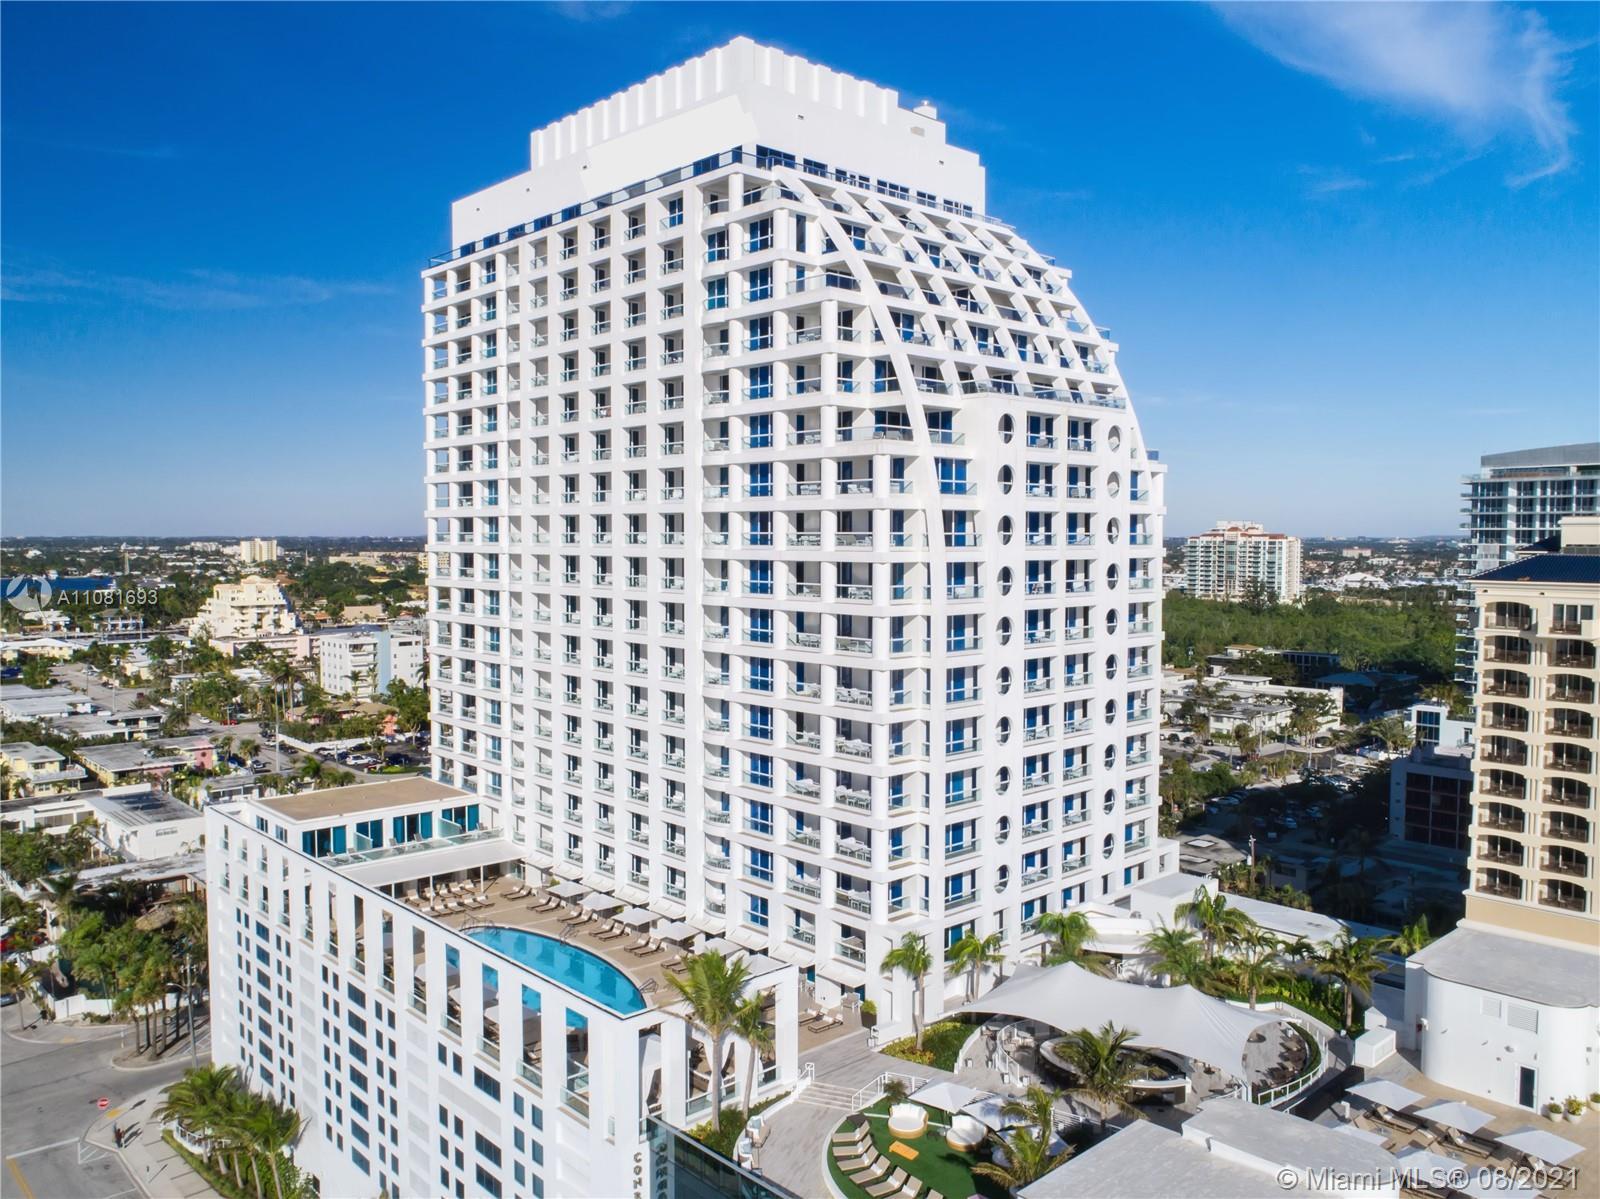 551 N Fort Lauderdale Beach Blvd #R1803 photo02